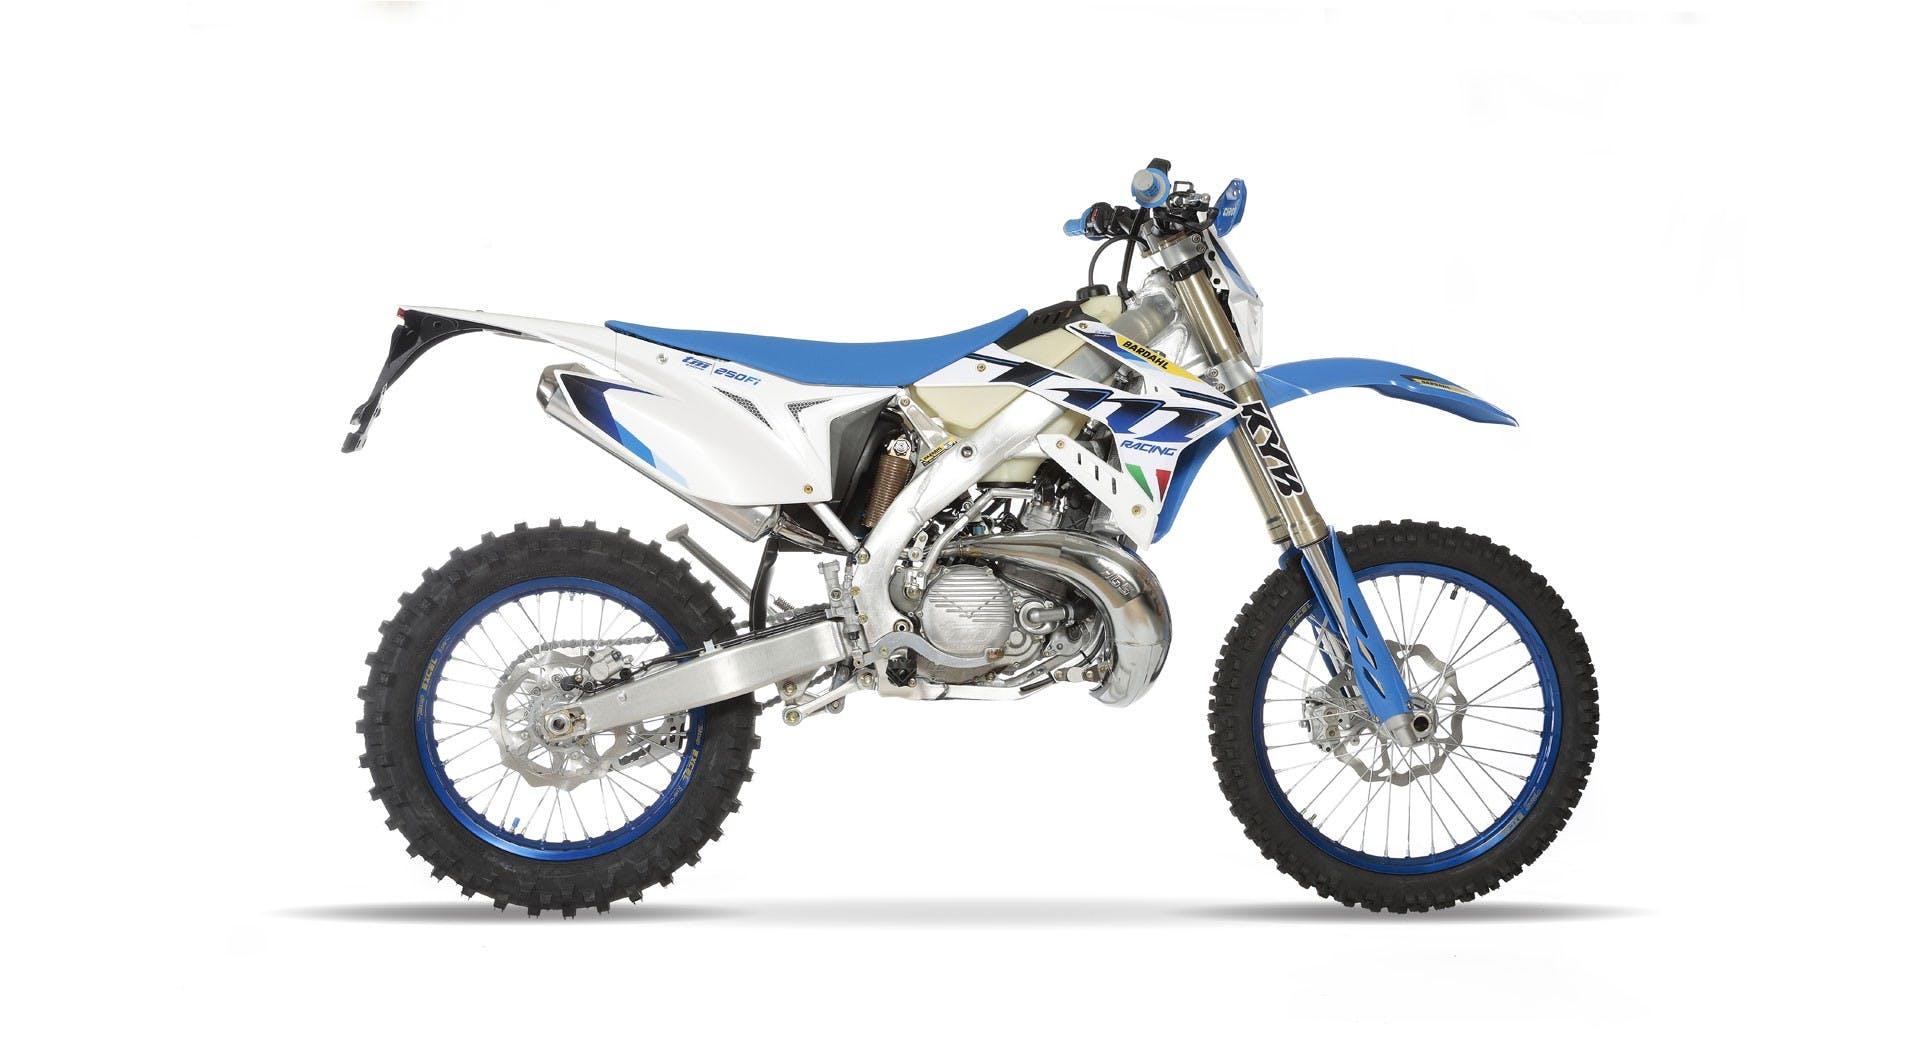 TM EN 250 Fi ES 2T Migliori moto da enduro 2021